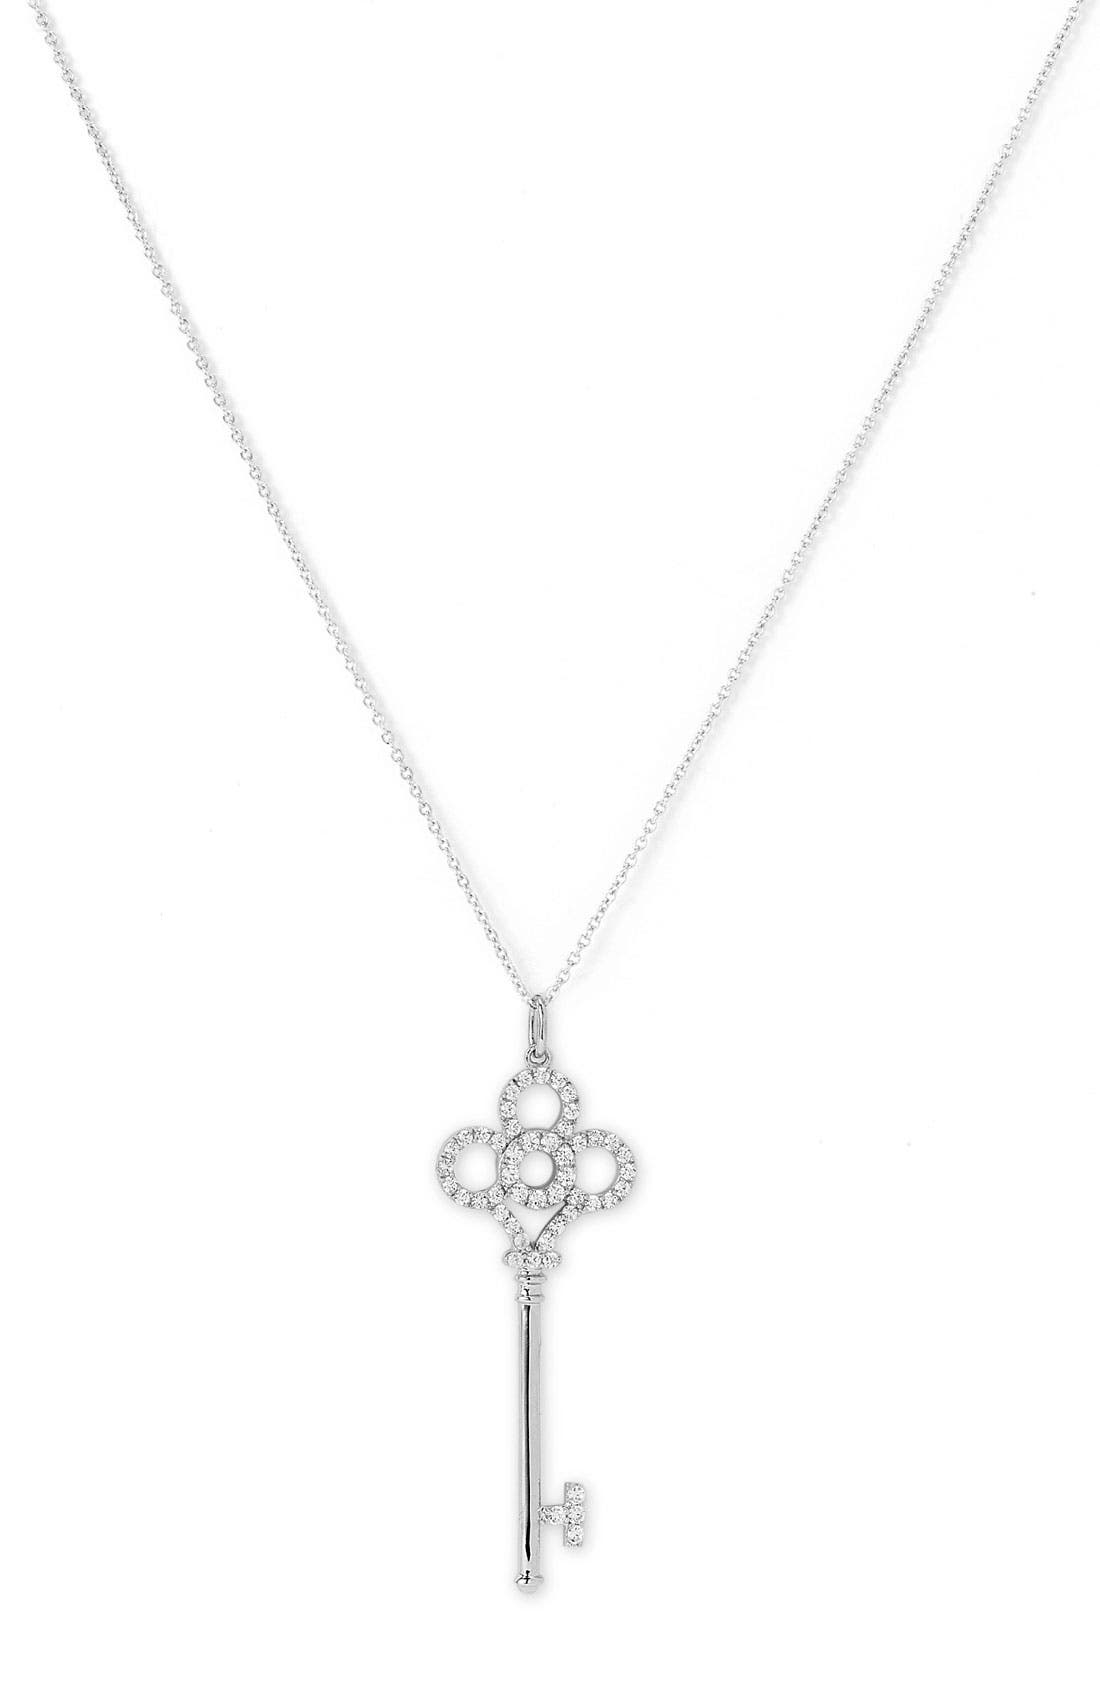 Main Image - Nordstrom Key Pendant Necklace